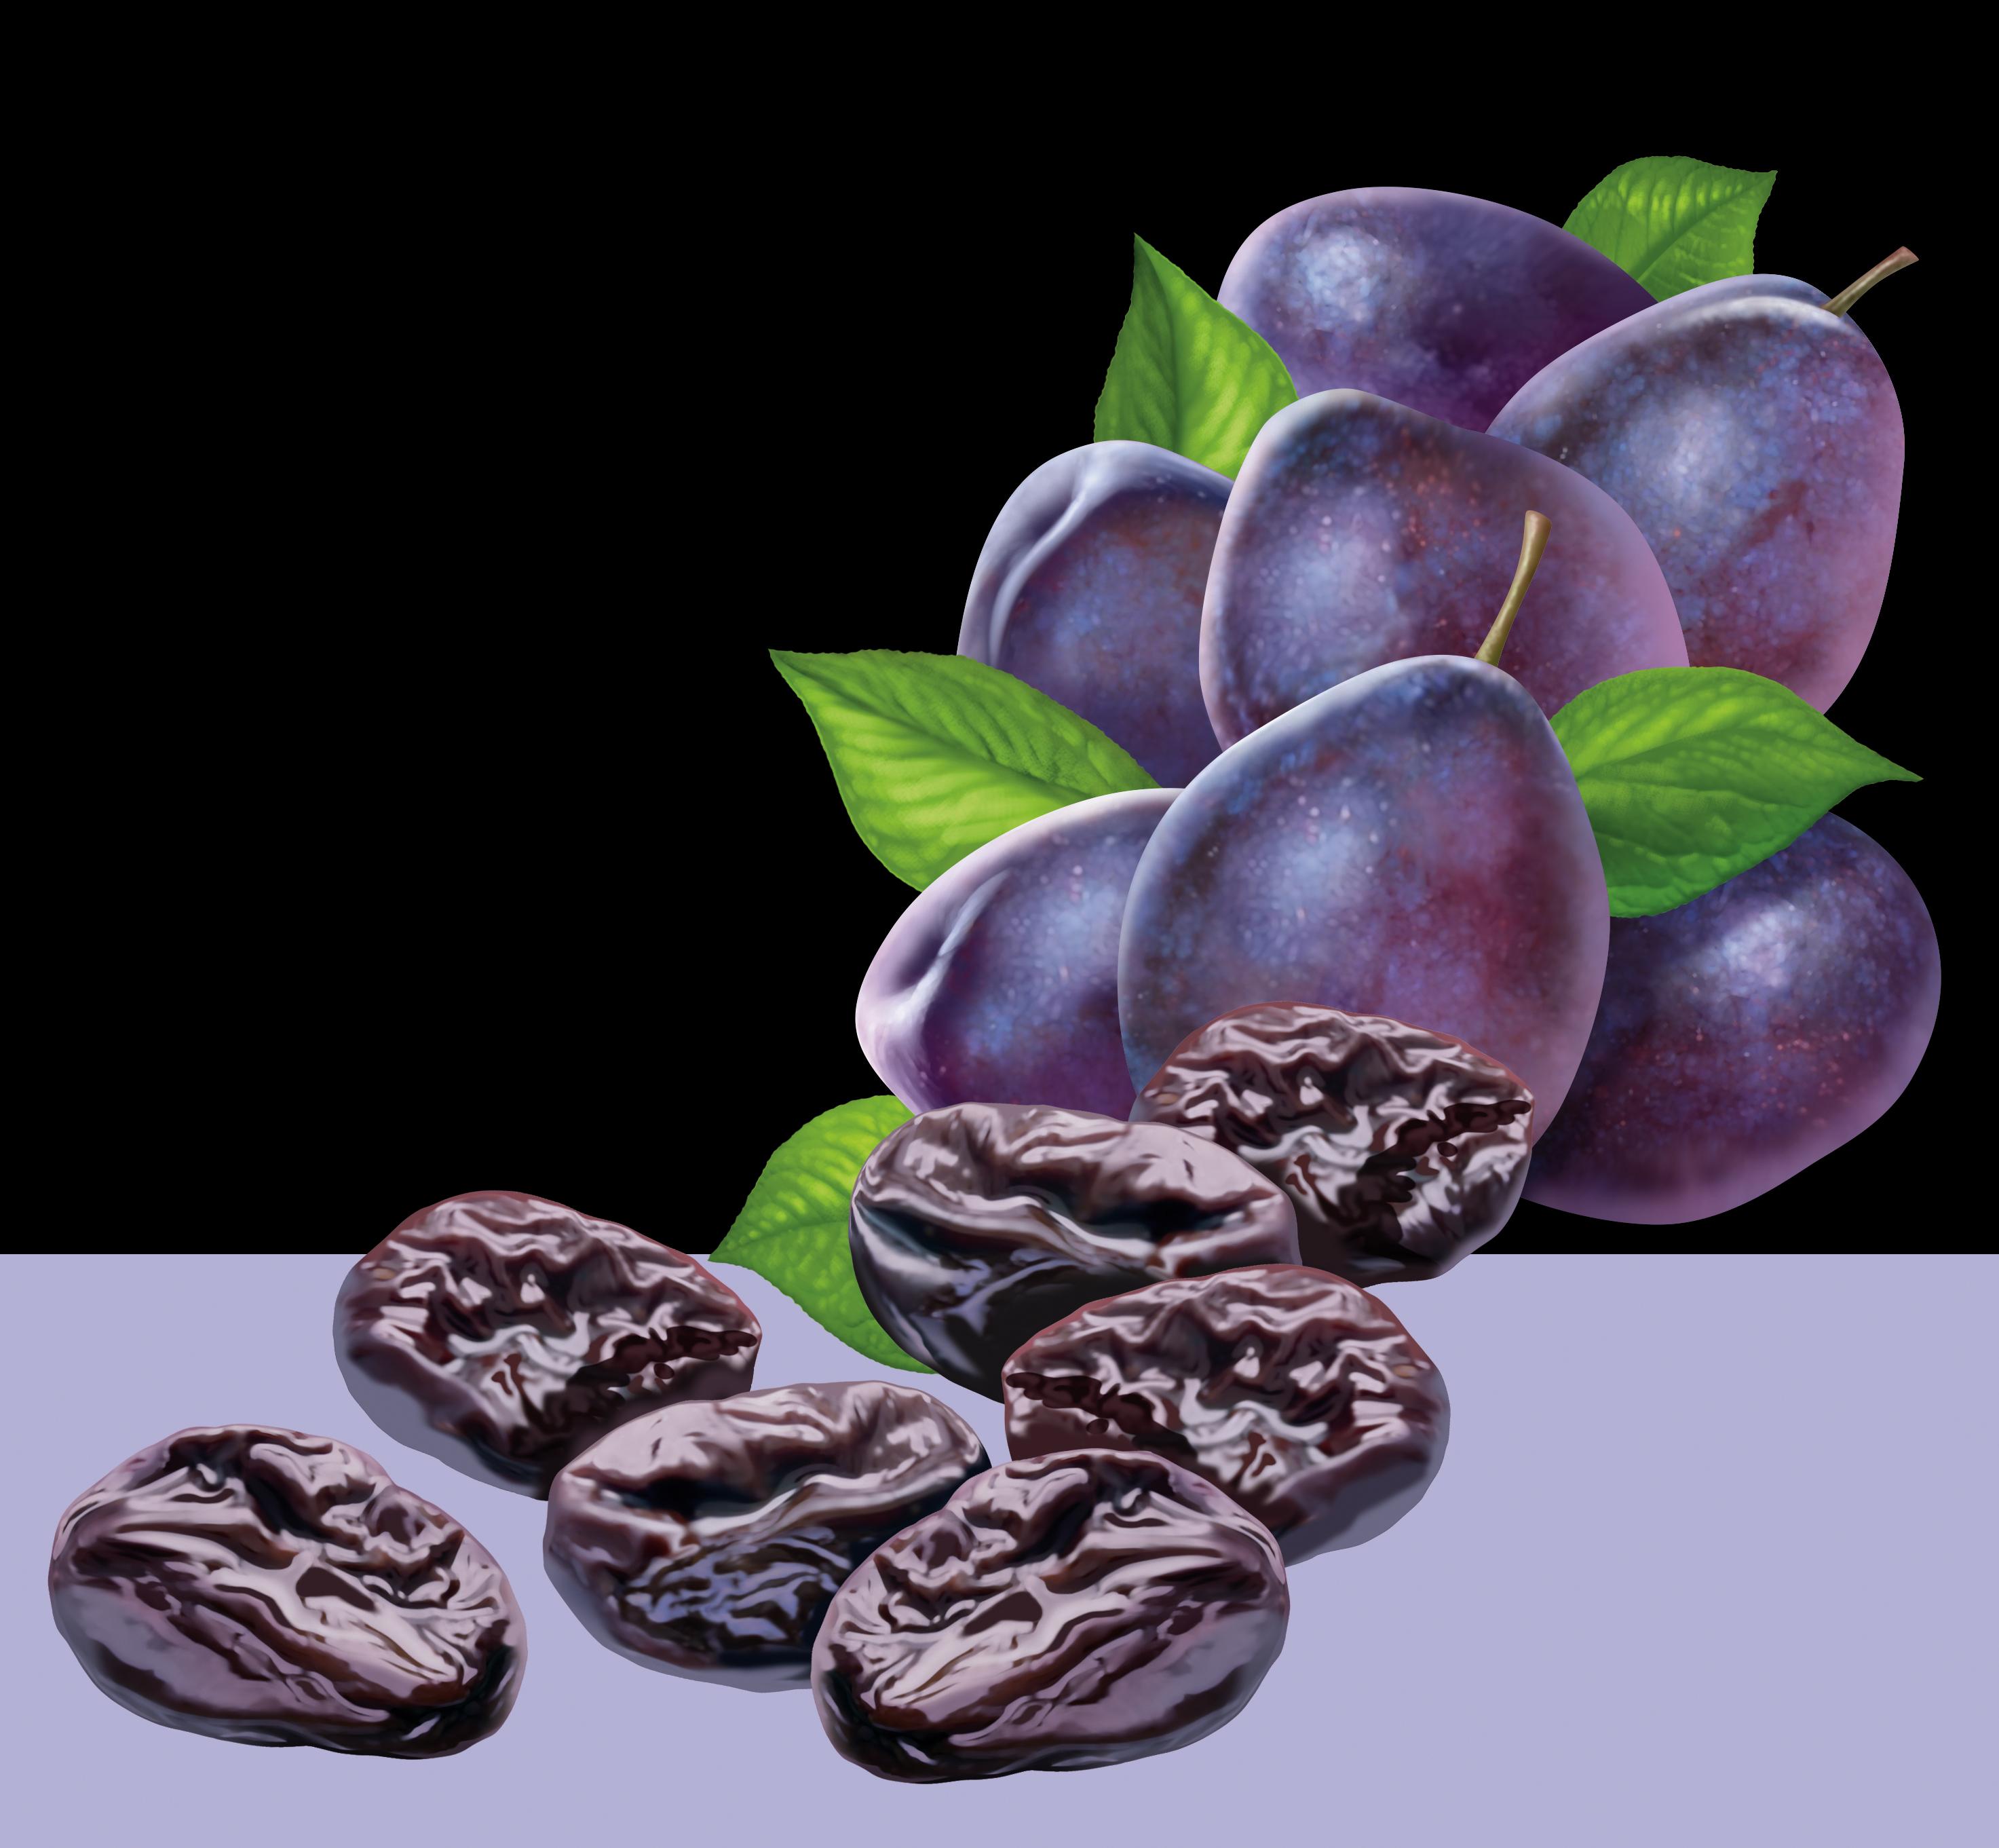 Whole Prunes